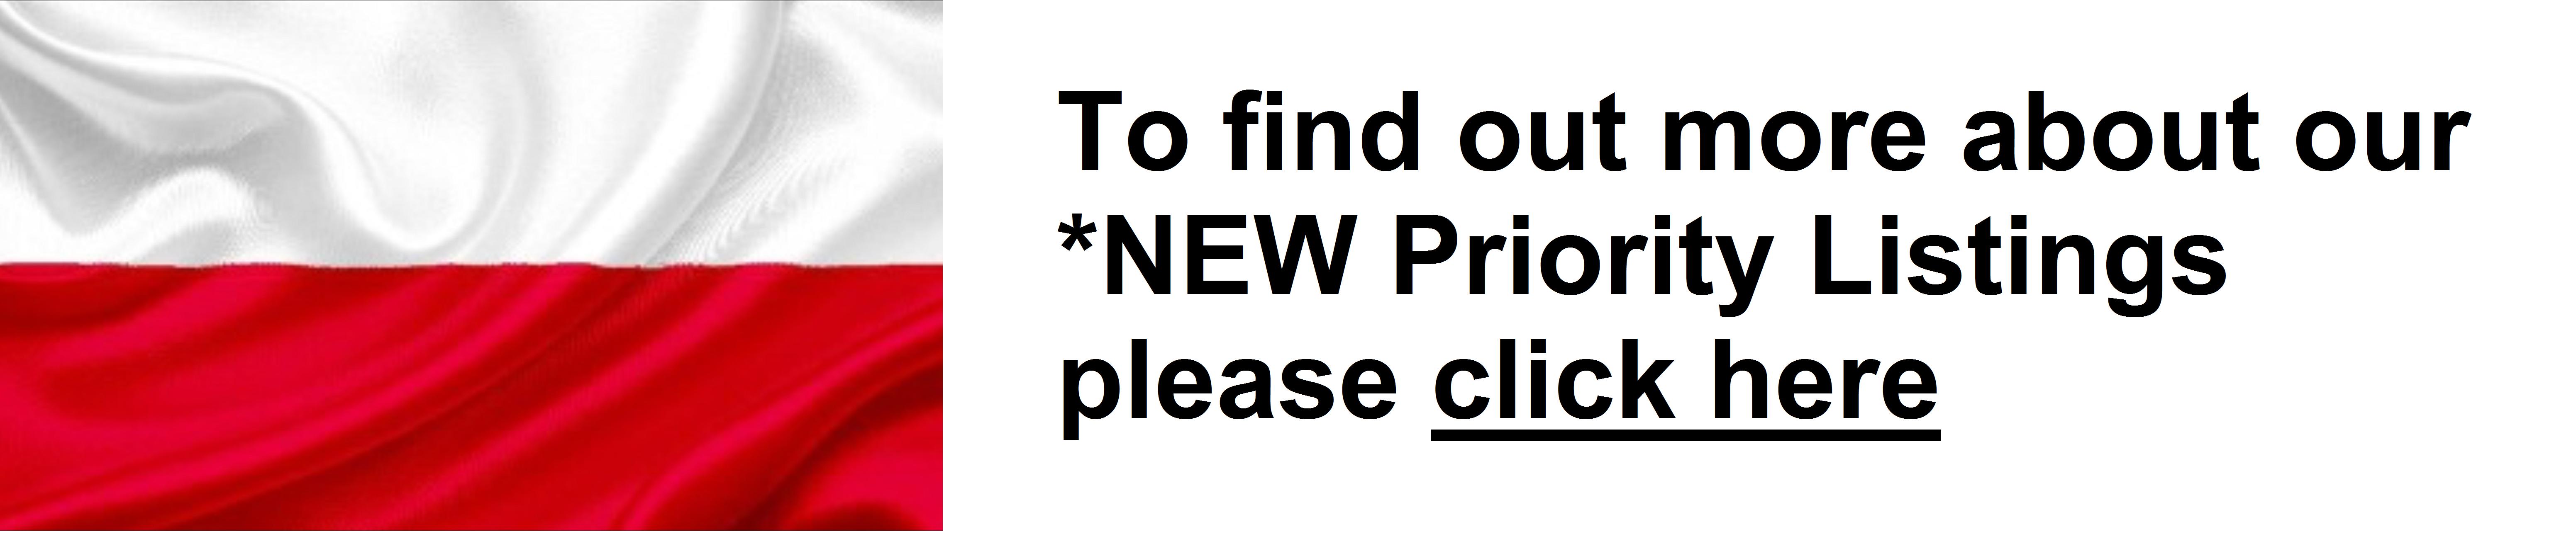 http://www.polishfloridabiz.com/priority-listings/